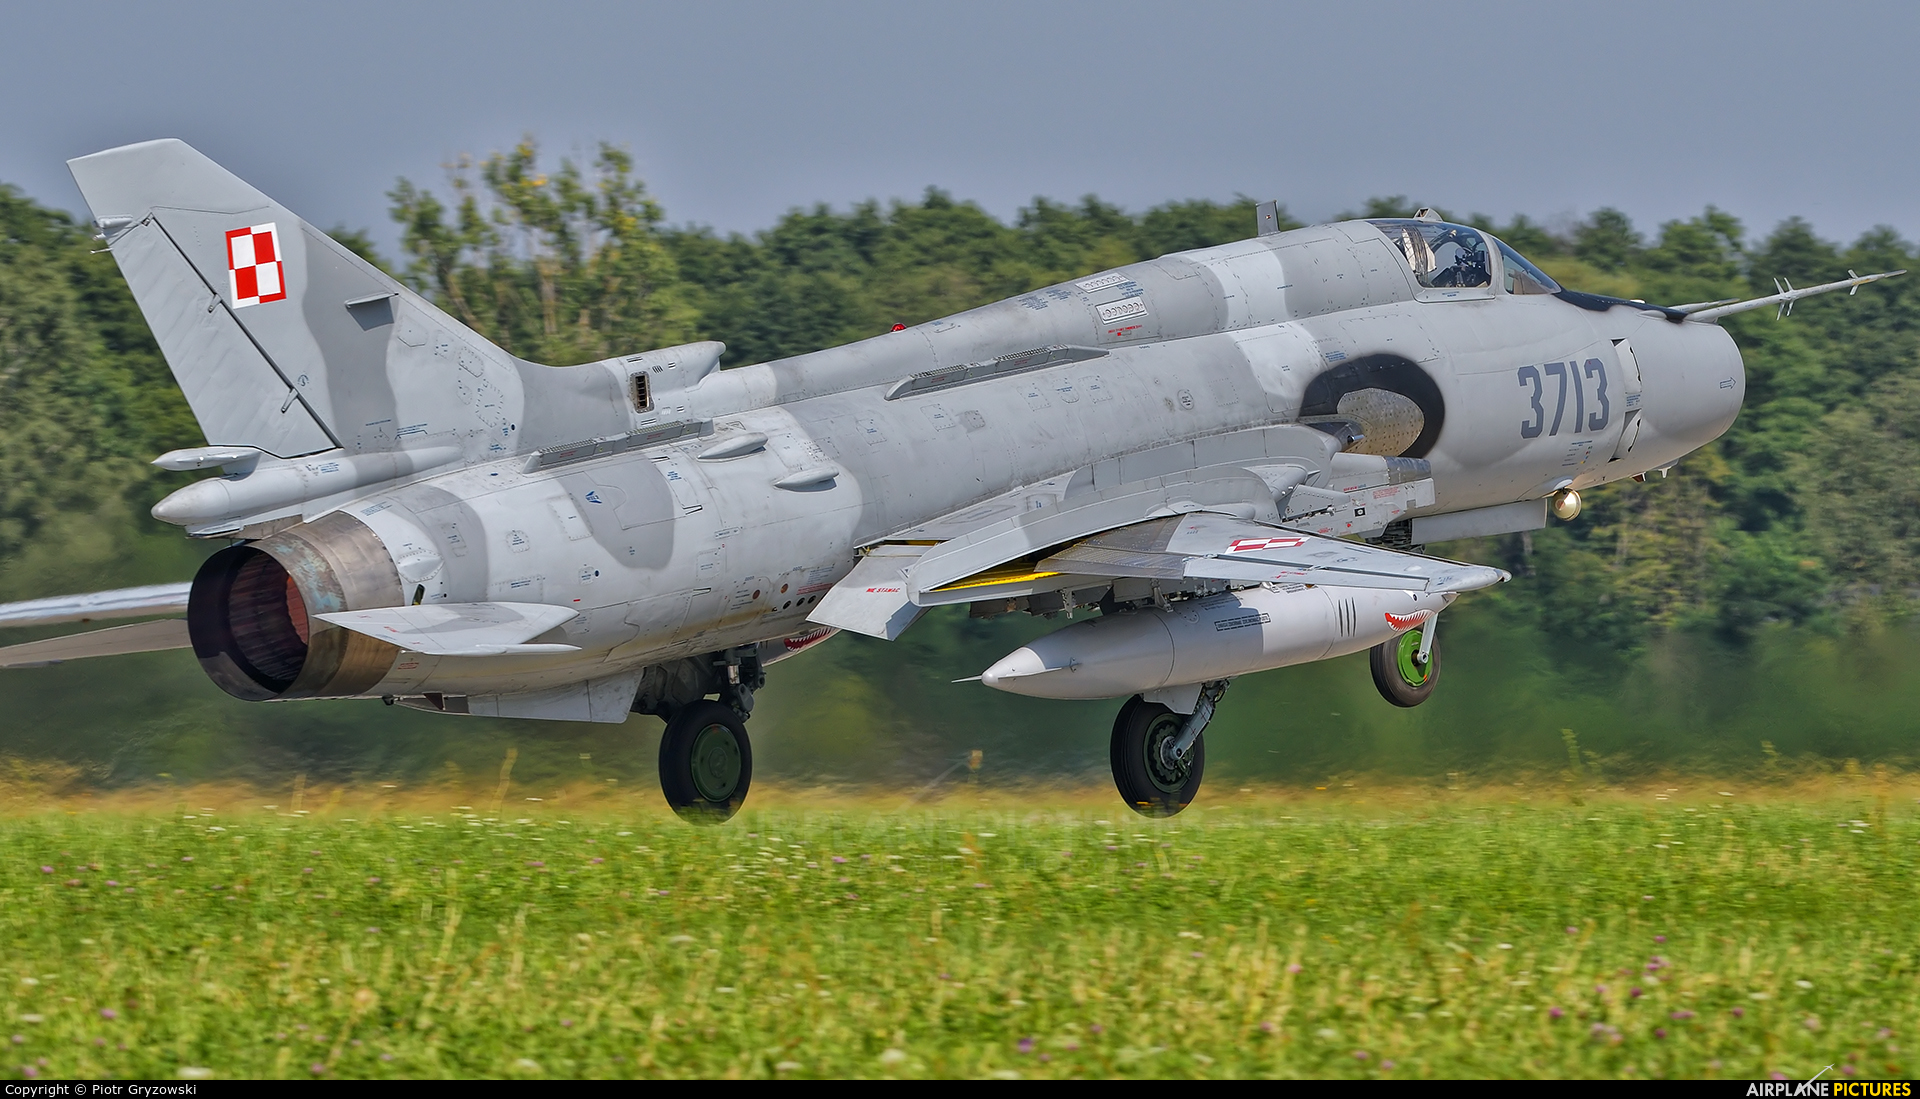 Poland - Air Force 3713 aircraft at Mińsk Mazowiecki